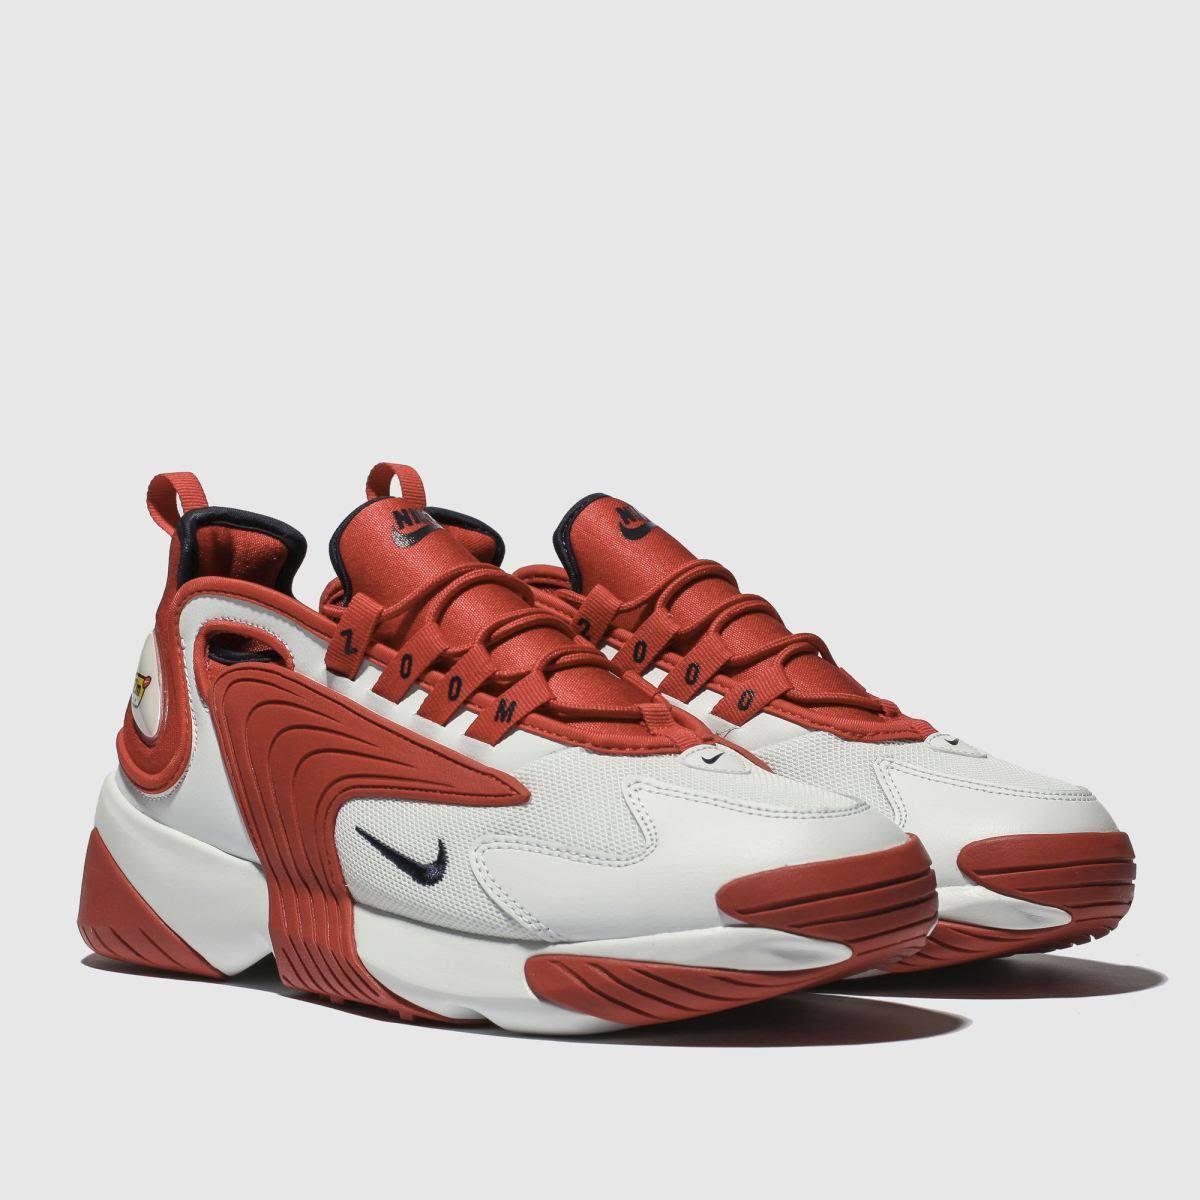 Weiß 2k rot Zoom Nike Sneaker Herren 8T05qPxv